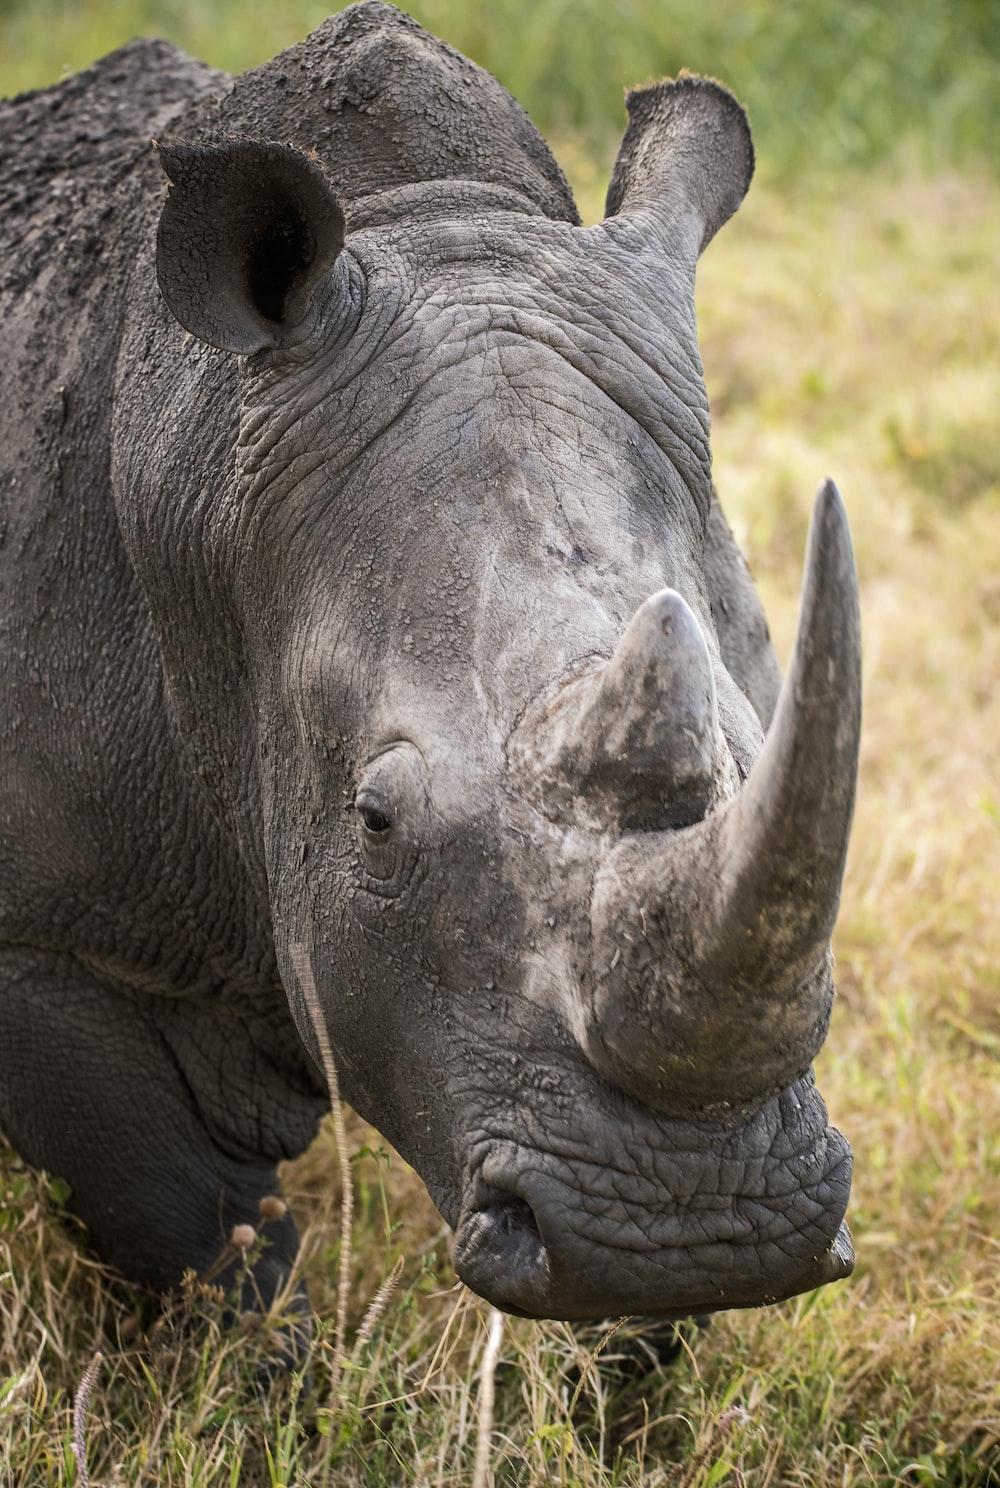 closeup of gray rhinoceros on green grass